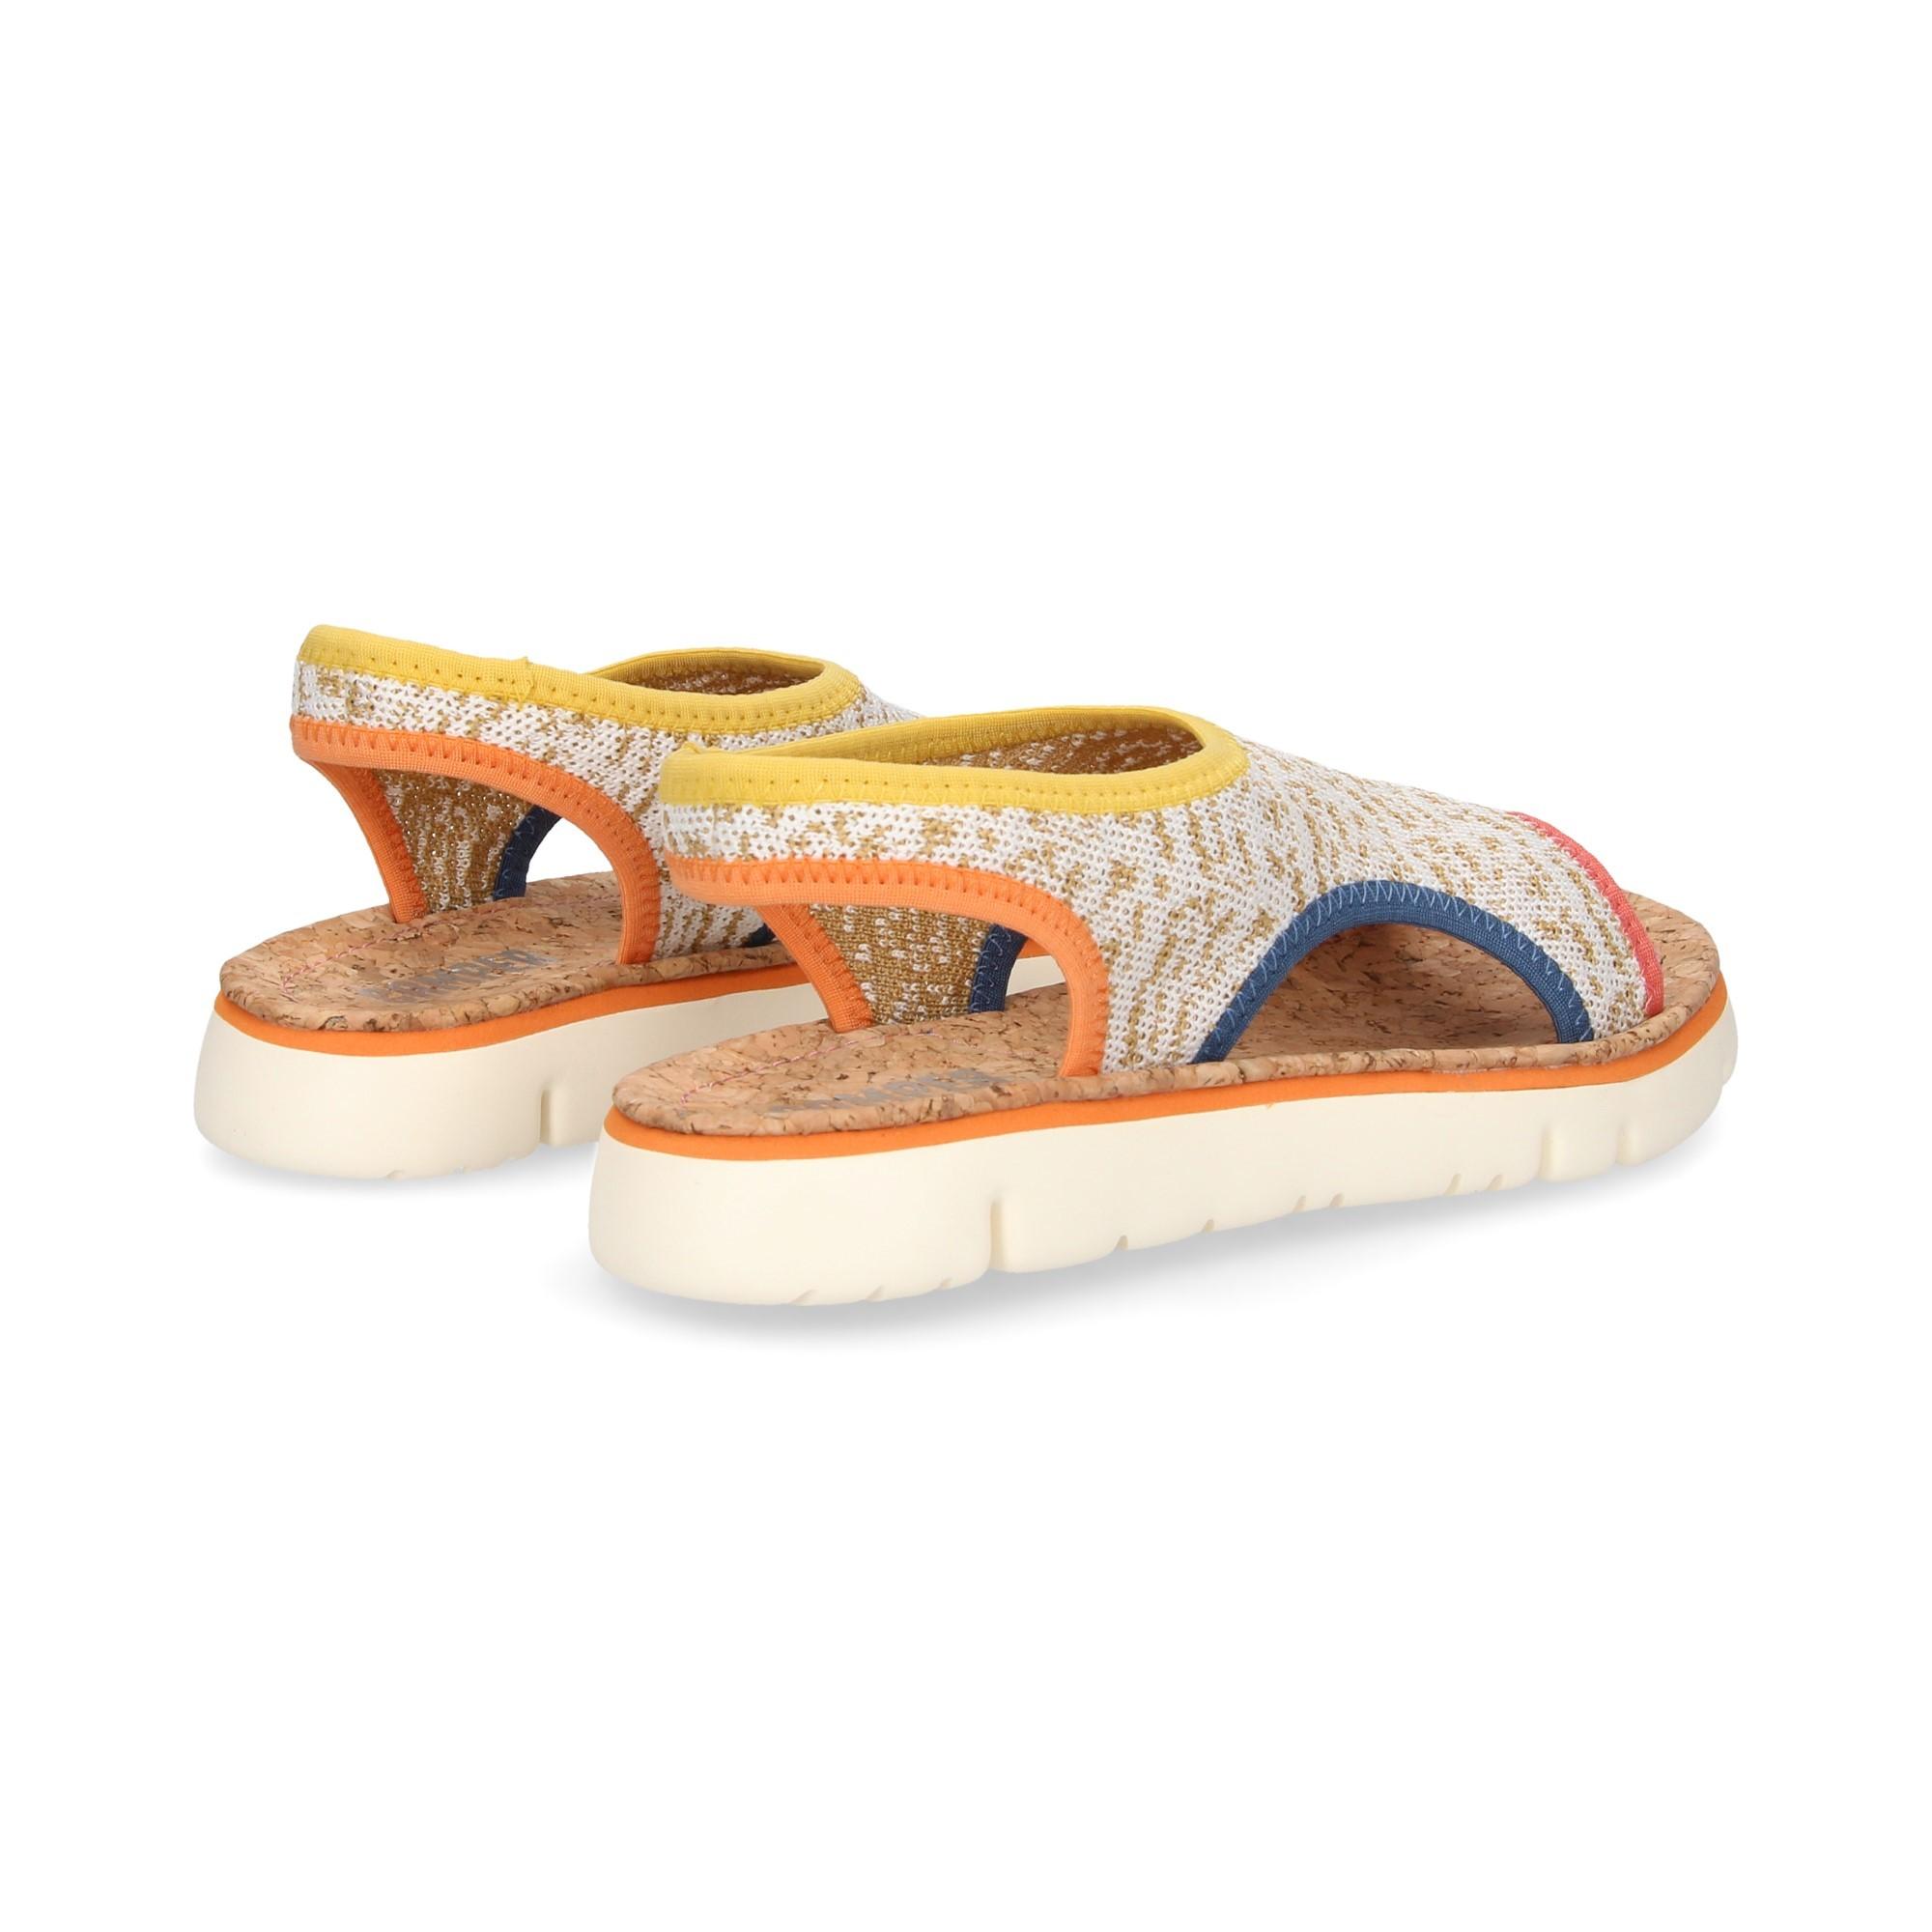 sandalia-textil-multicolor-blanco